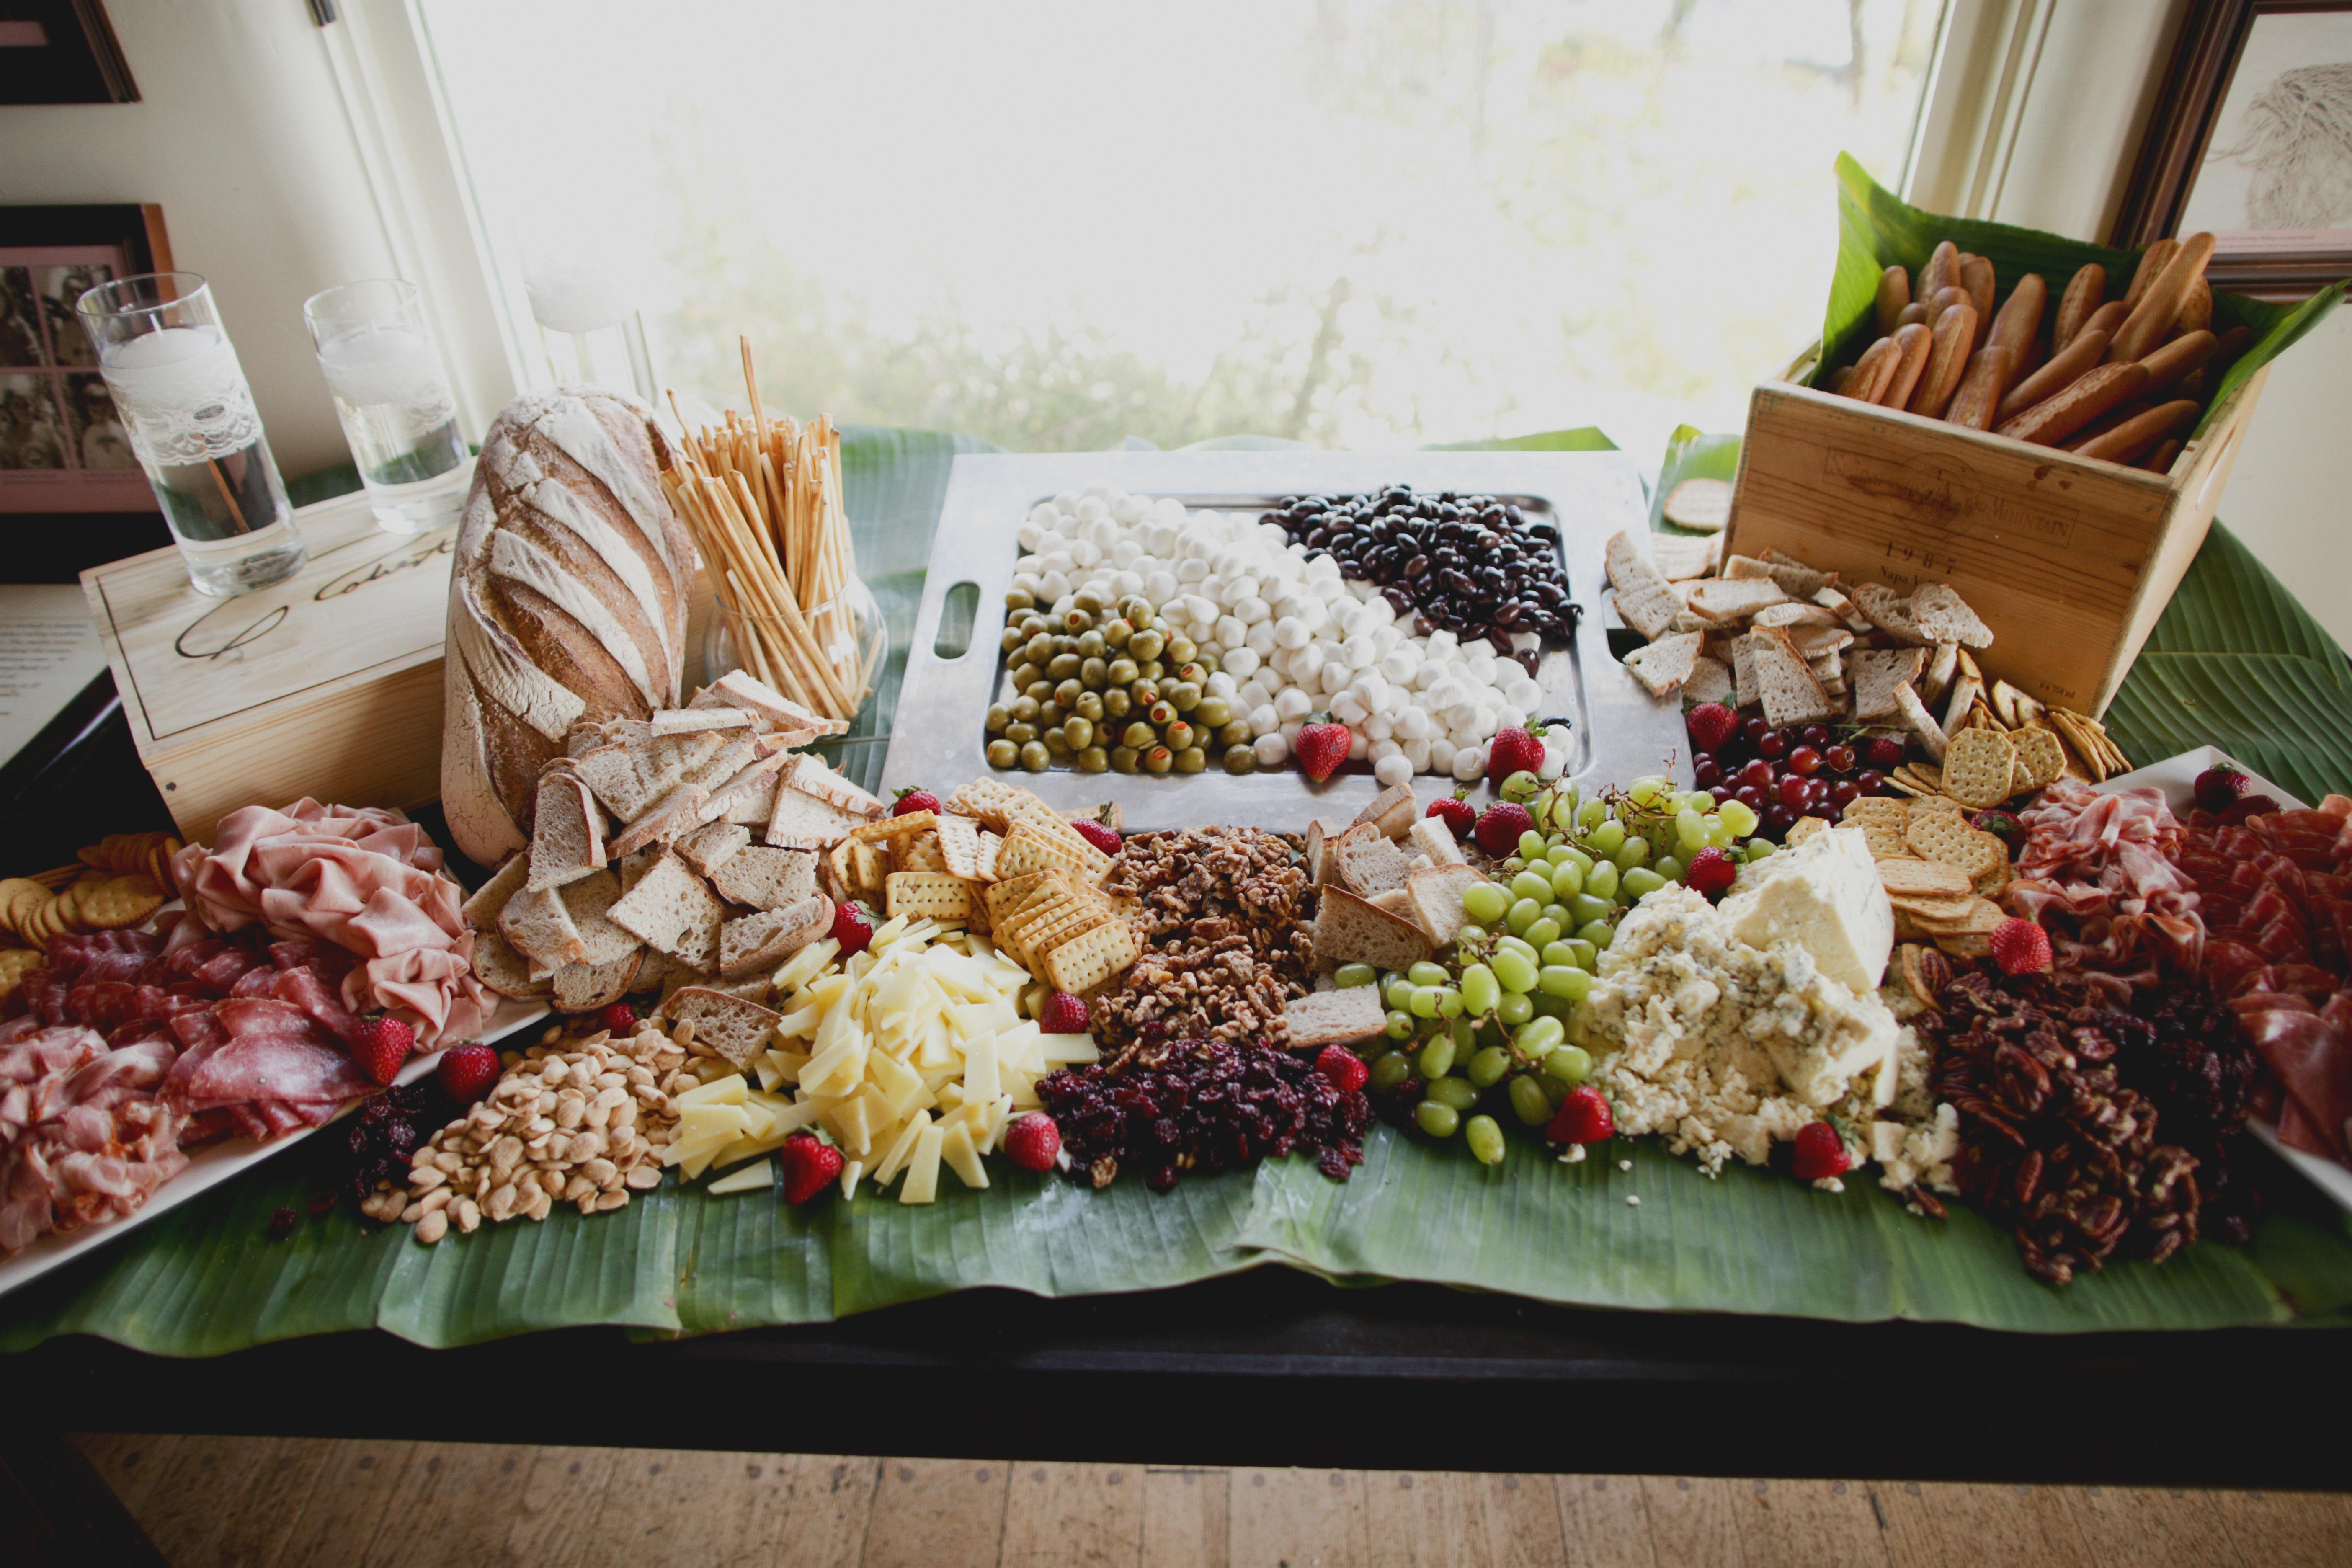 Iva Lee's catering, Casa Romantica wedding, San clemente wedding planner, A Good Affair Wedding & Event Production